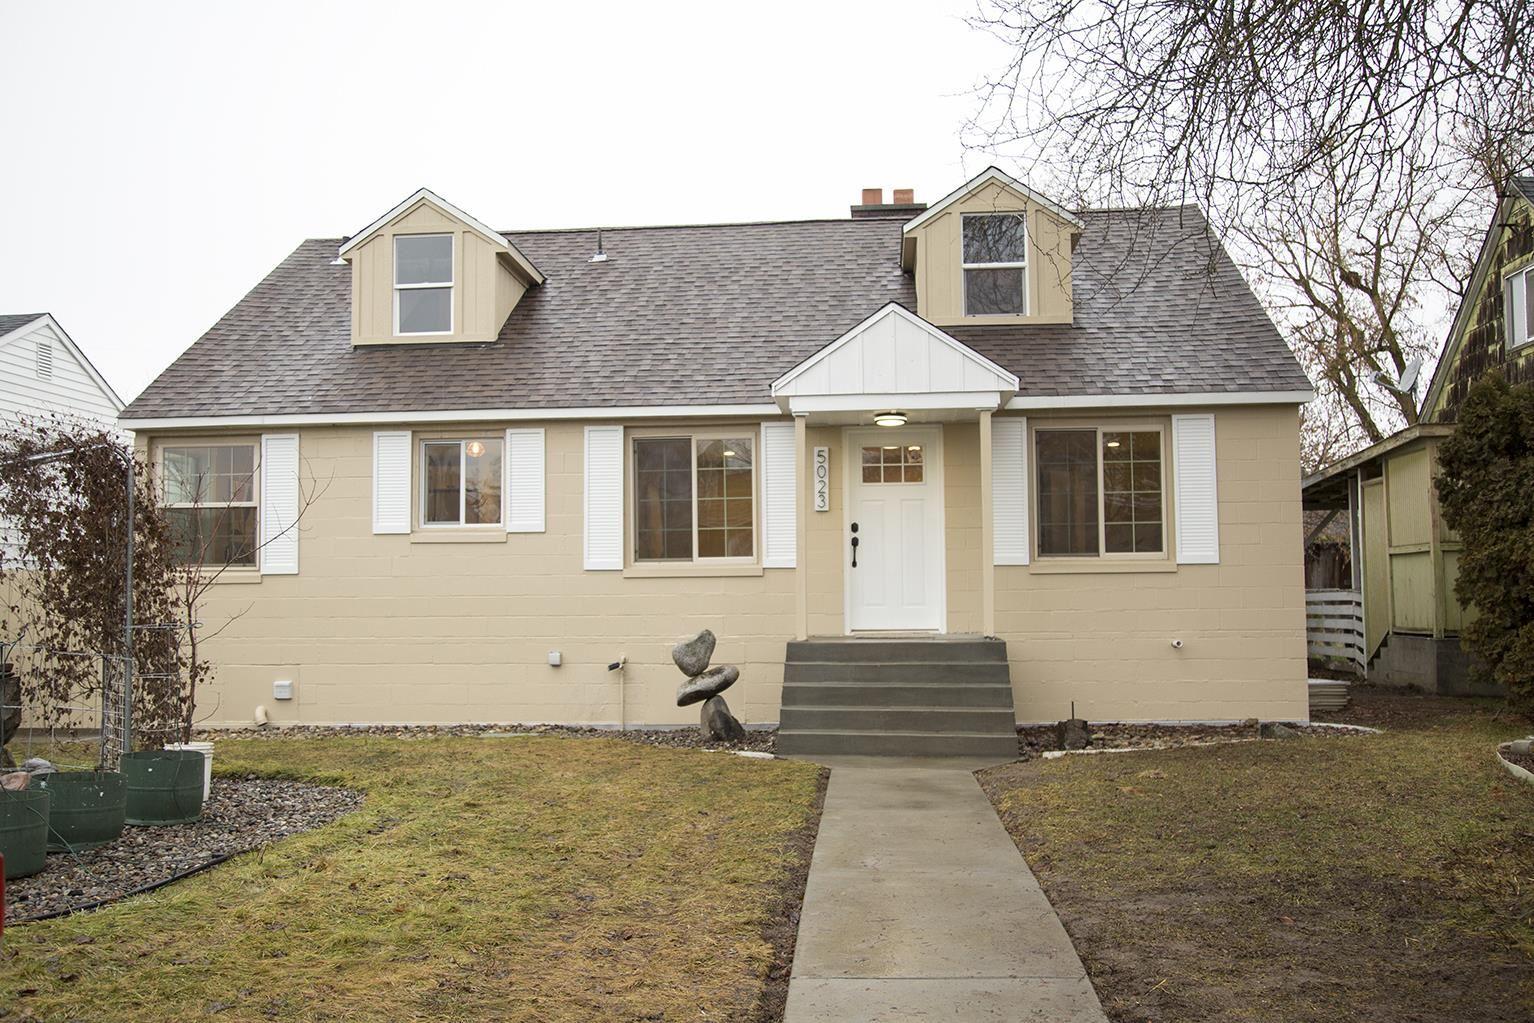 5023 N Washington St, Spokane, WA 99205 - #: 202110222